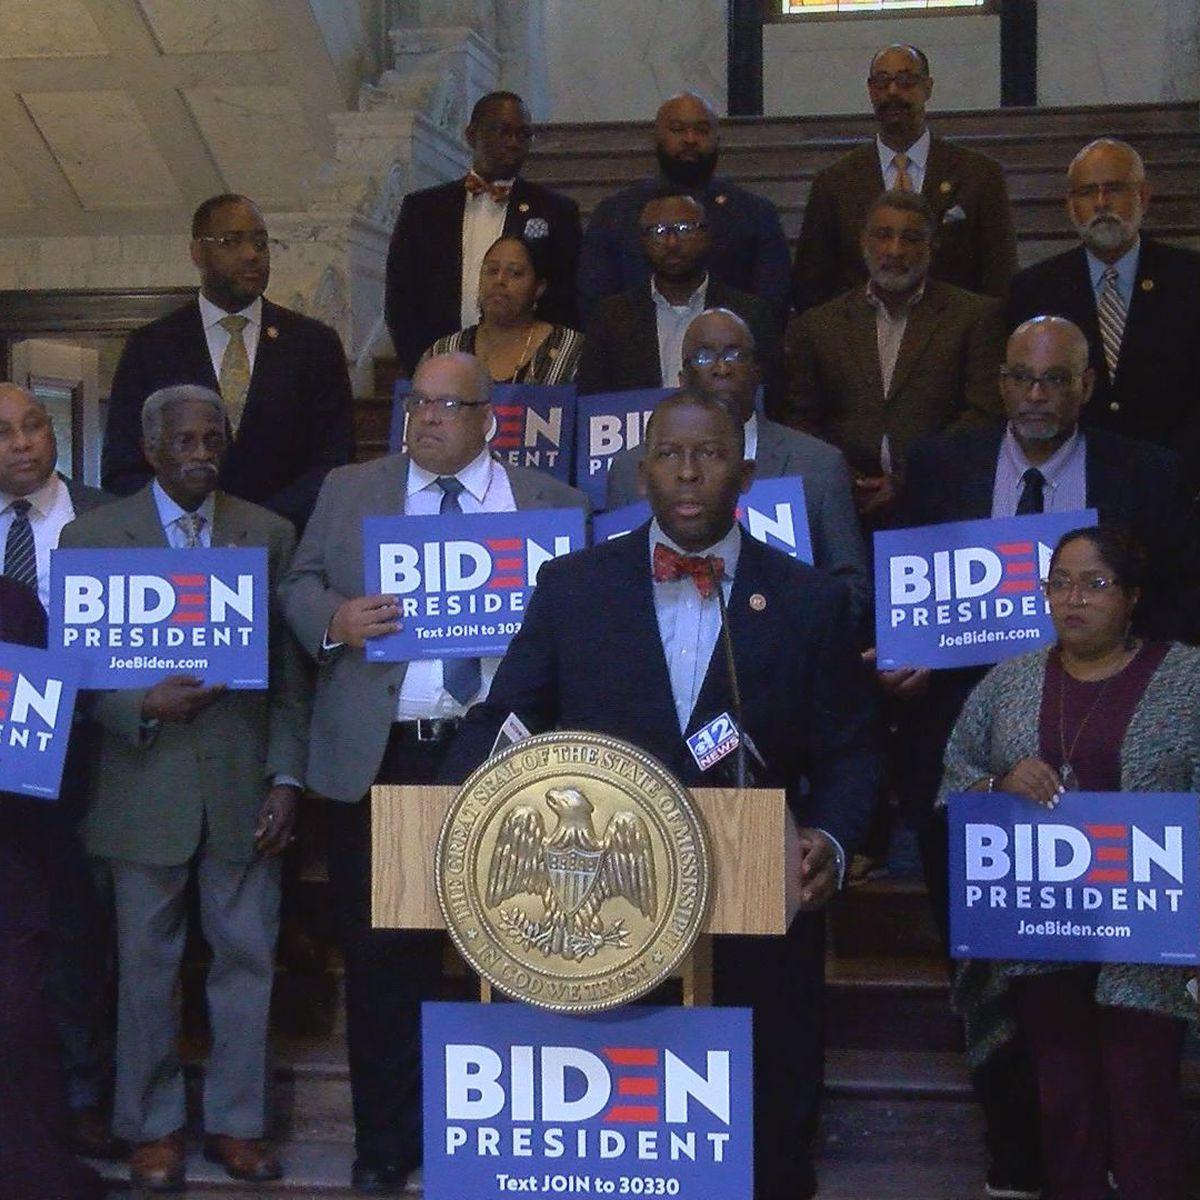 Mississippi Senate Democrats endorse Joe Biden for presidency